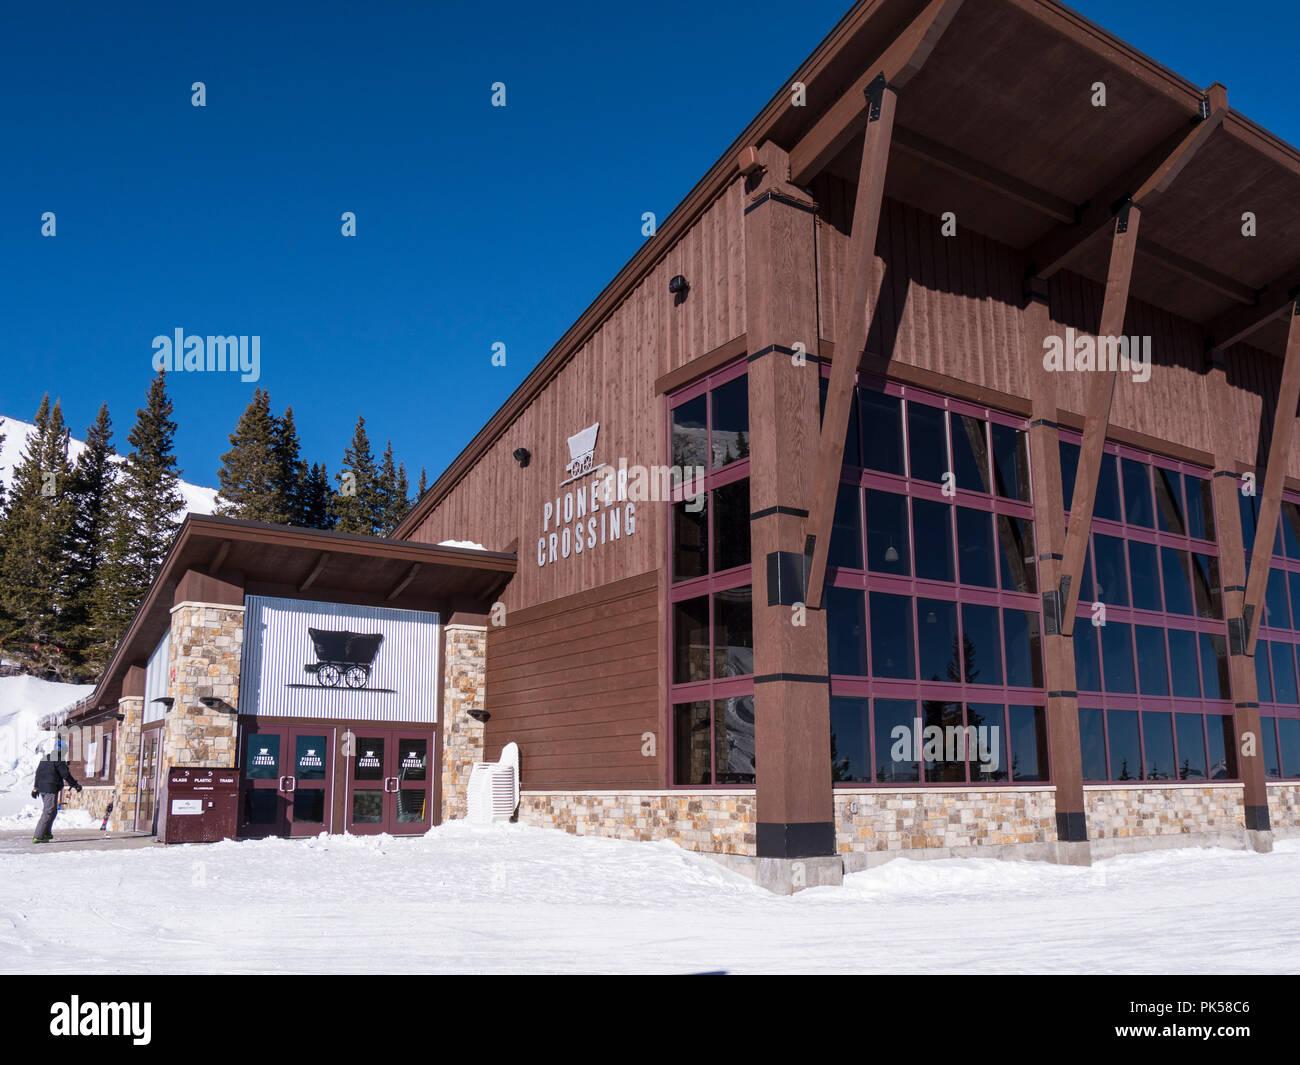 Pioneer Crossing day lodge and restaurant atop Peak 7, Breckenridge Ski Resort, Breckenridge, Colorado. - Stock Image